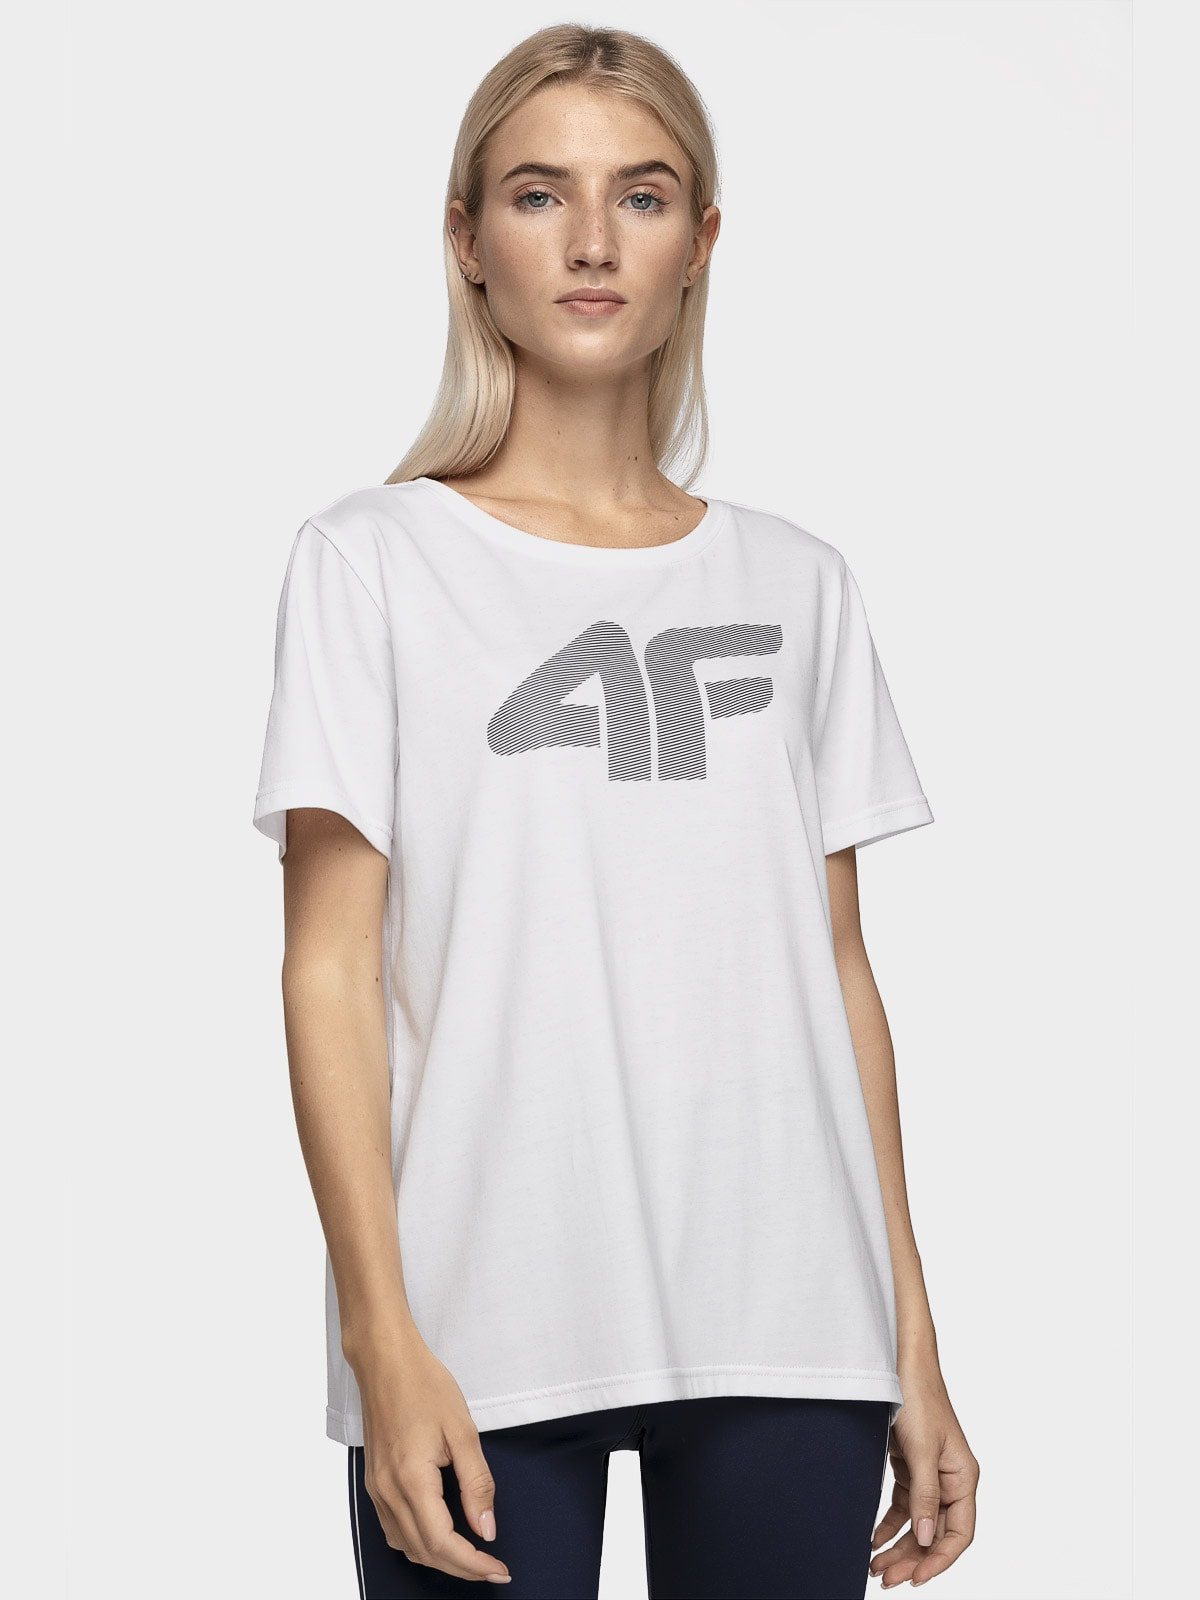 T-shirt damski TSD304 - biały